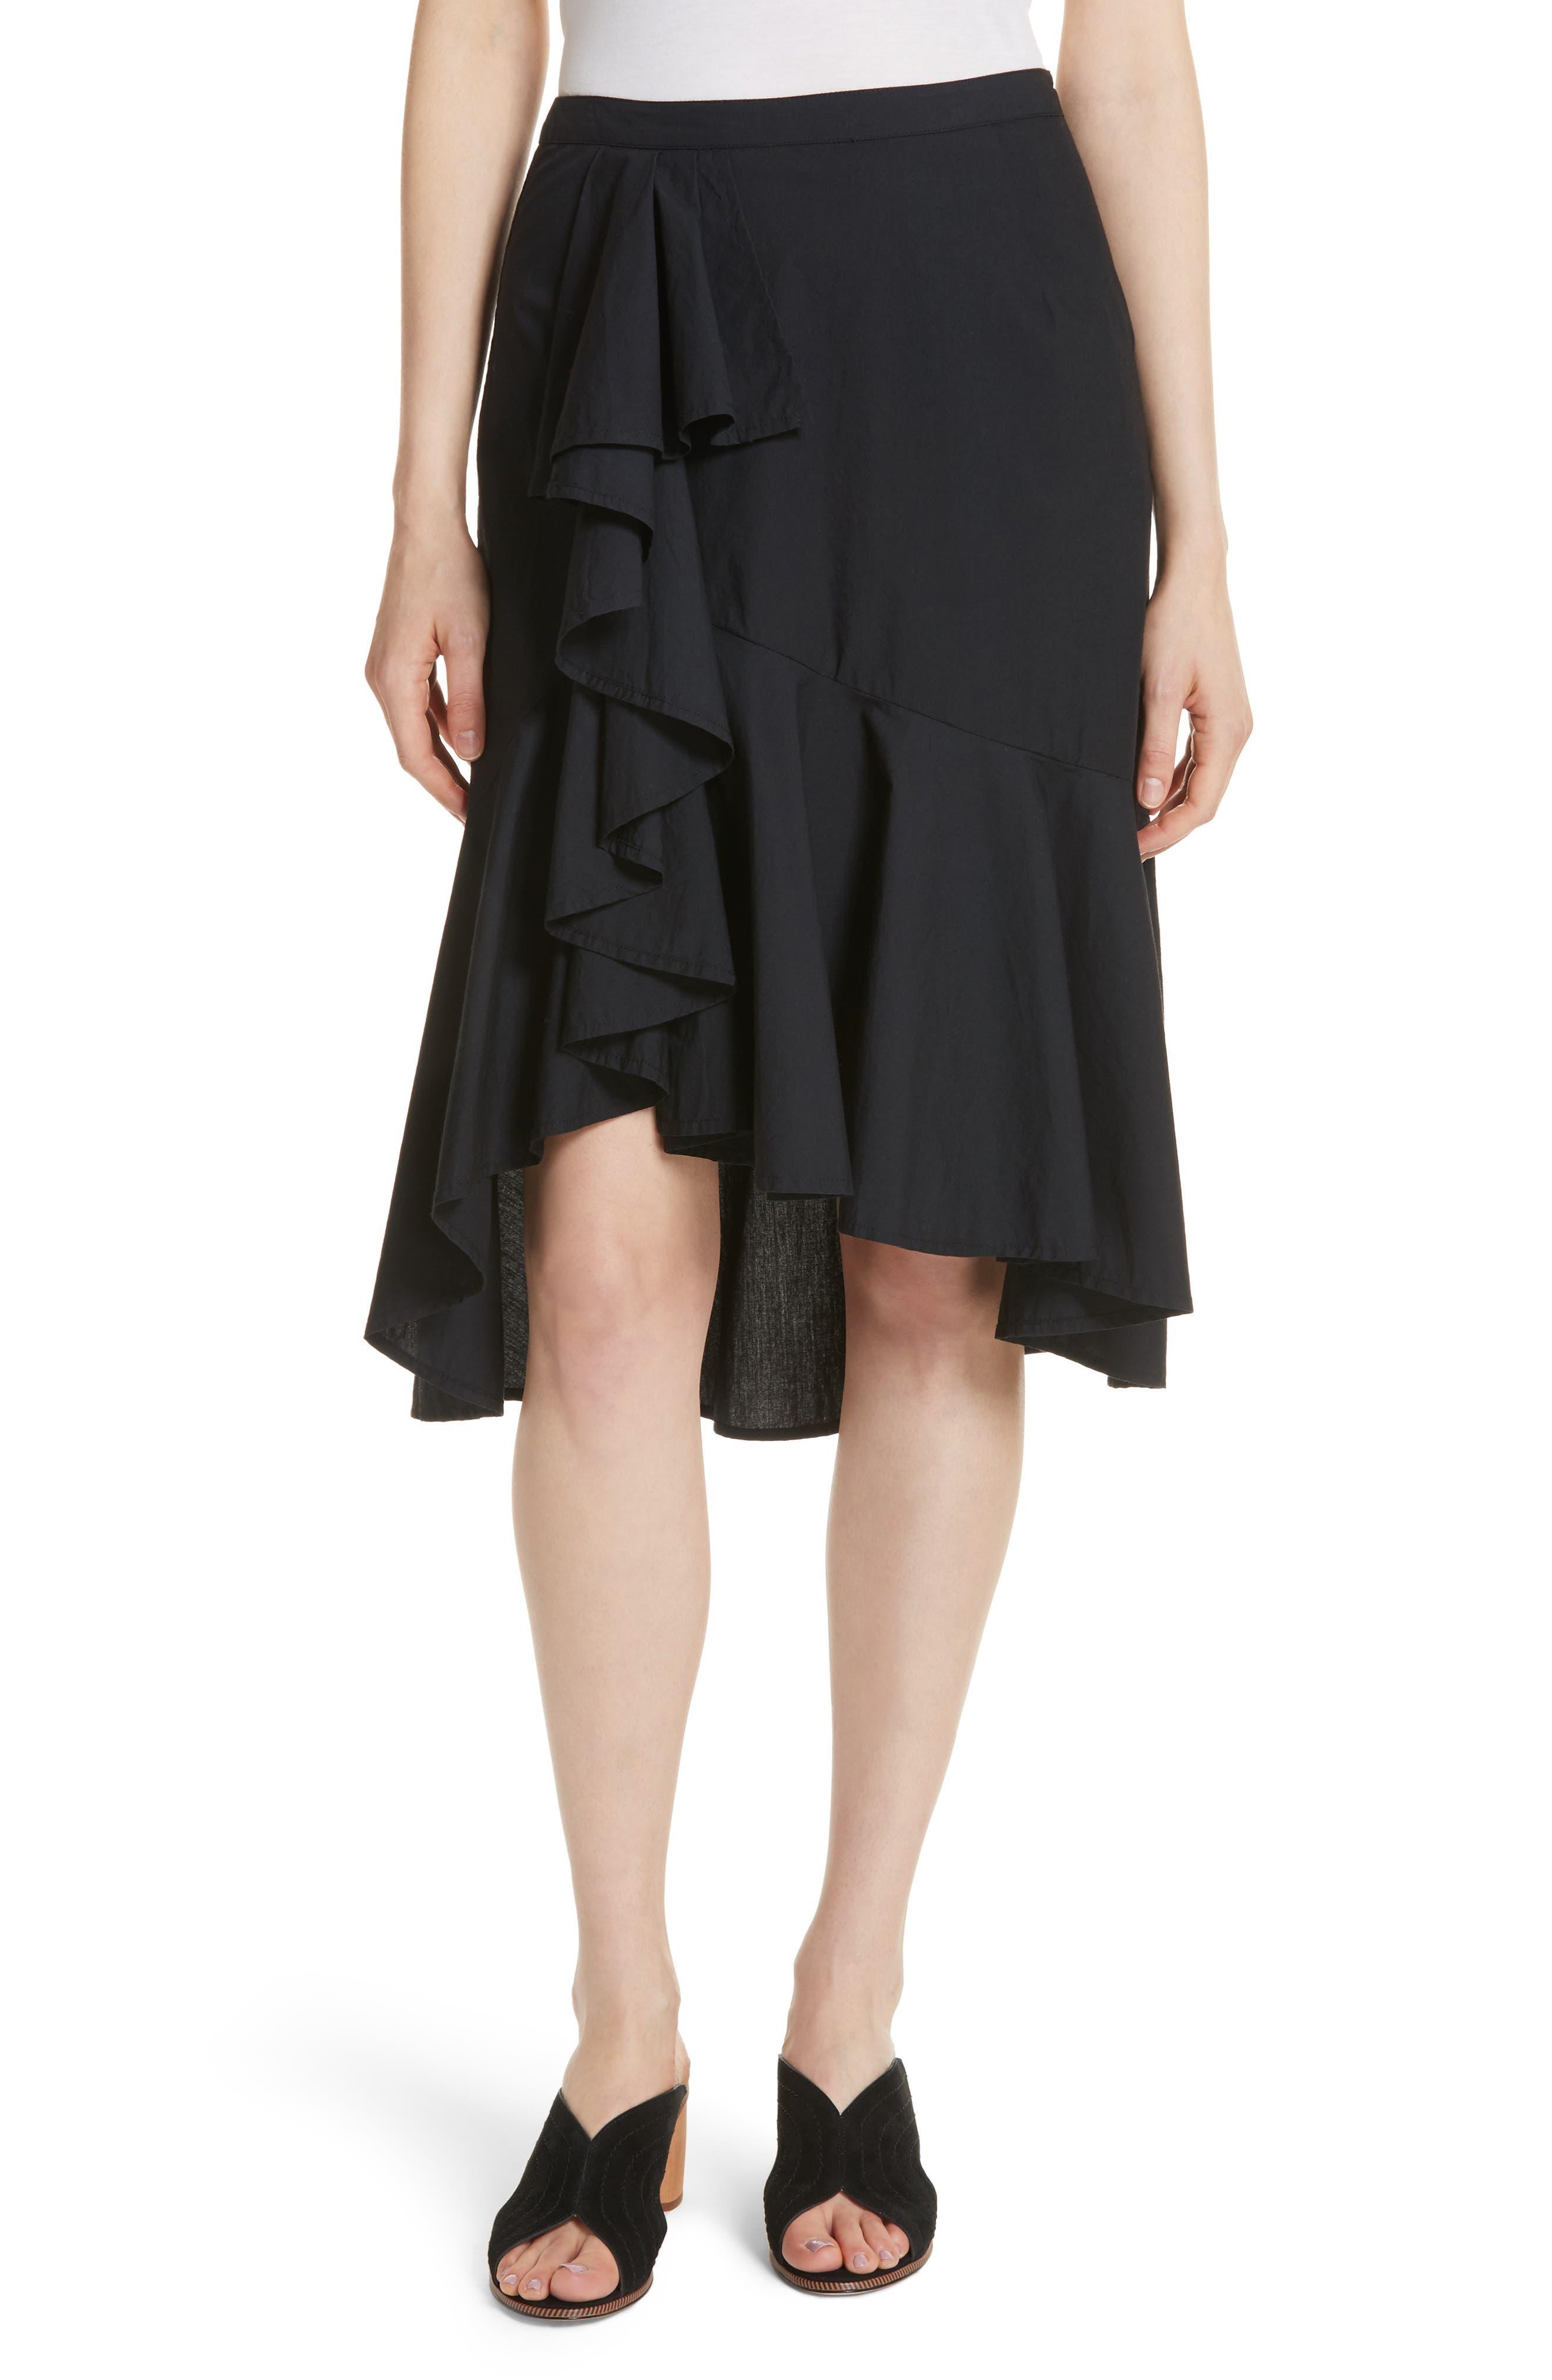 Chesmu Ruffled Cotton Skirt,                         Main,                         color, 001